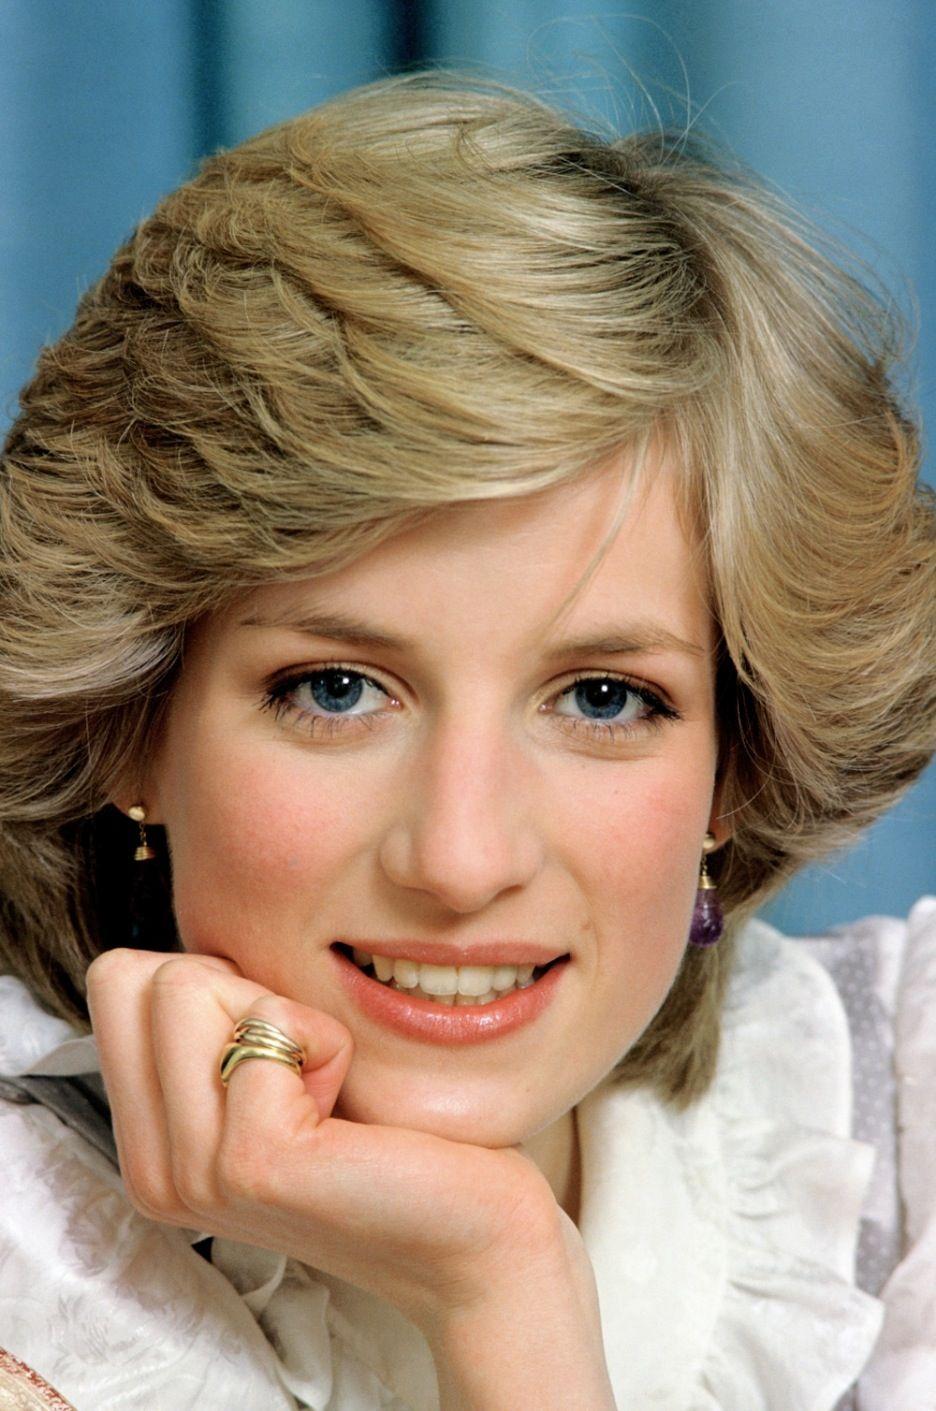 Hairstyle Diana Haircut Princess Diana Hair Feathered Hairstyles